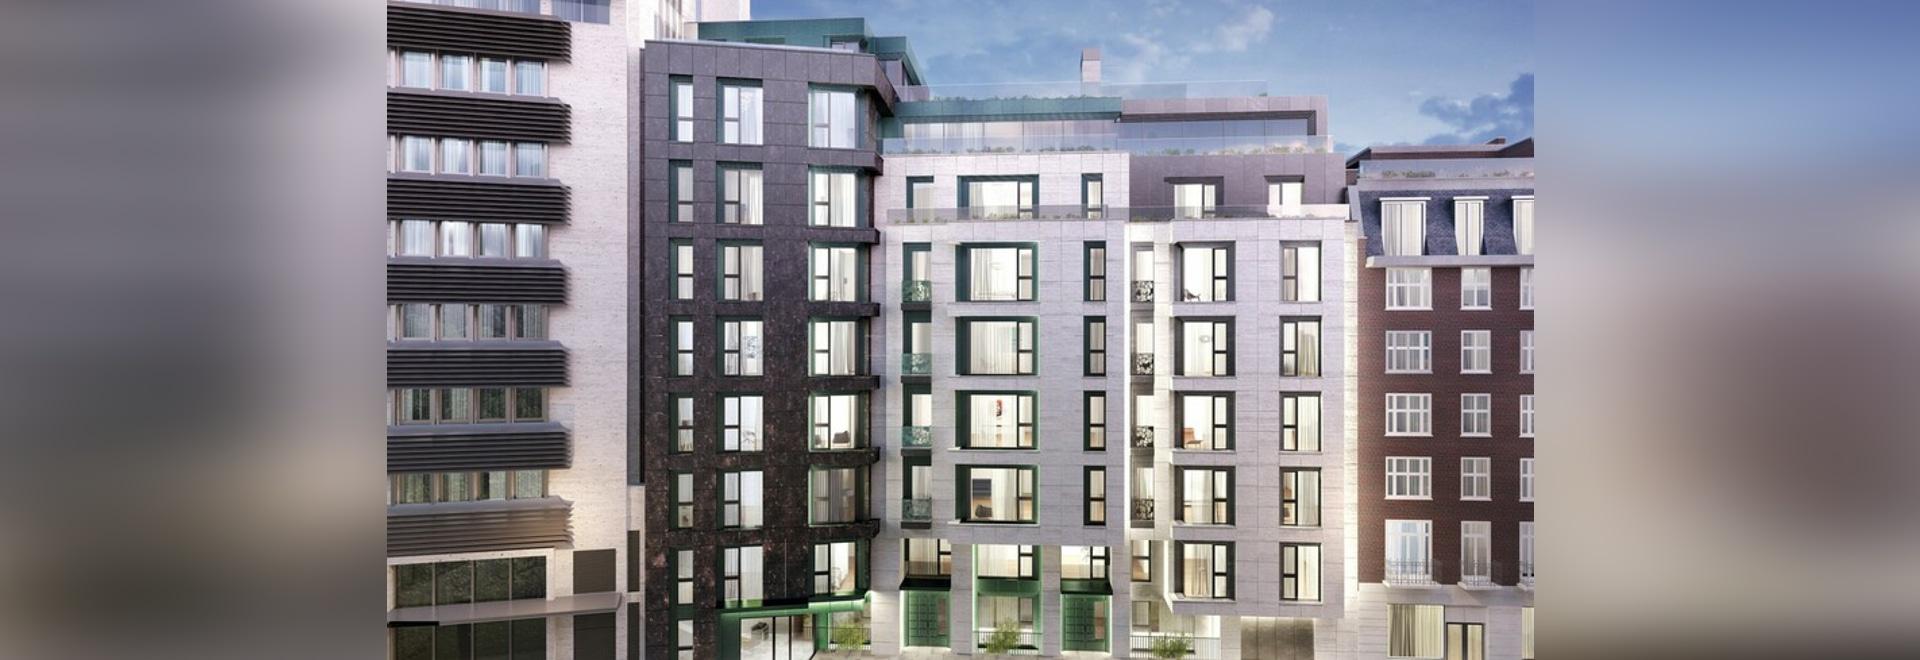 Mayfair Park Residences - London